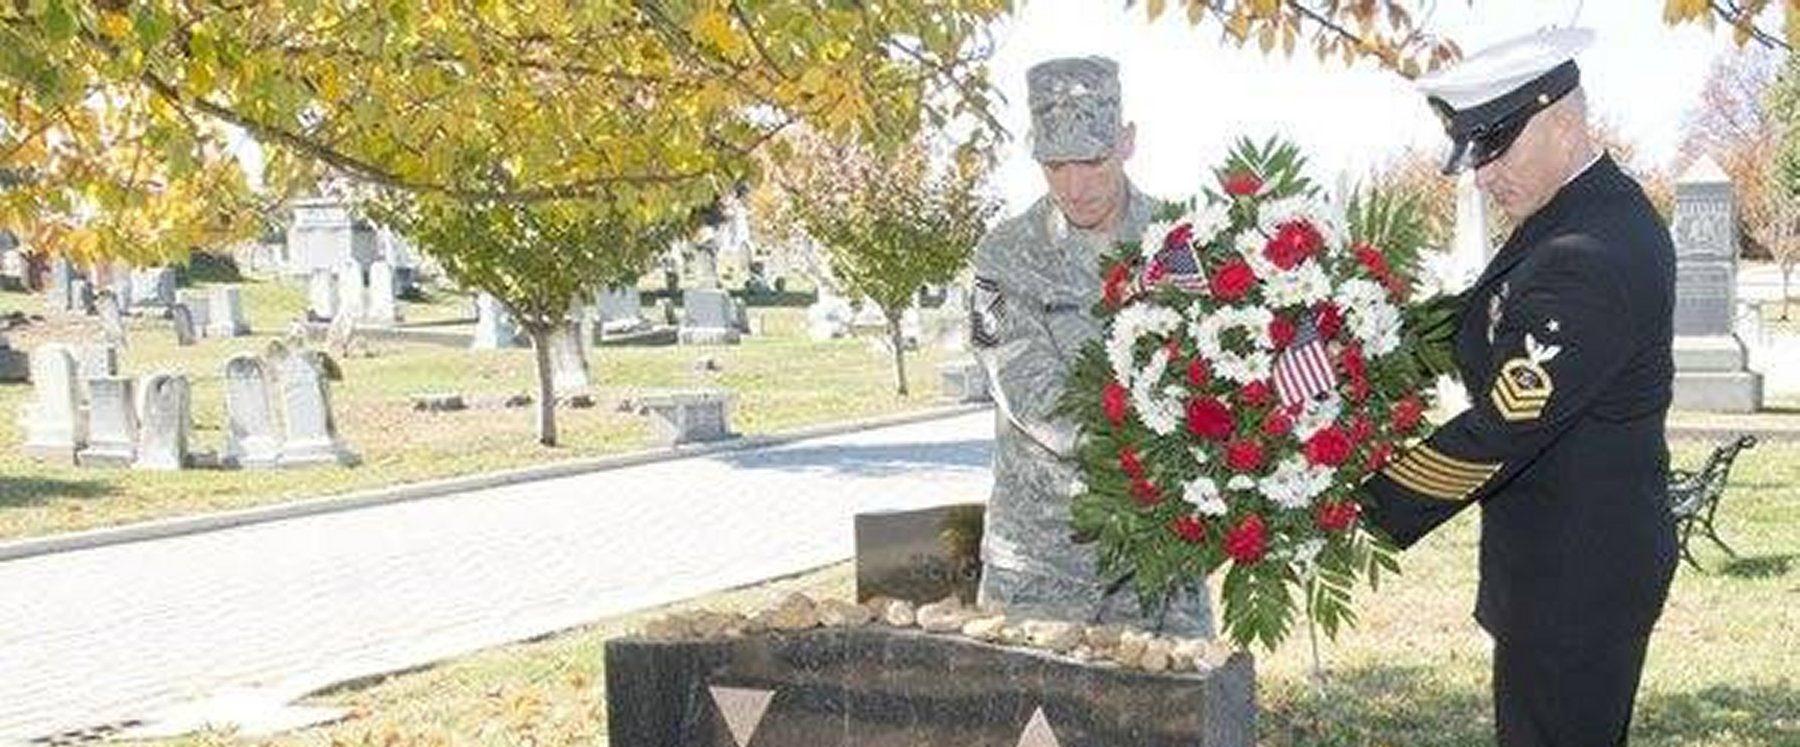 Veterans Day Annual Observance